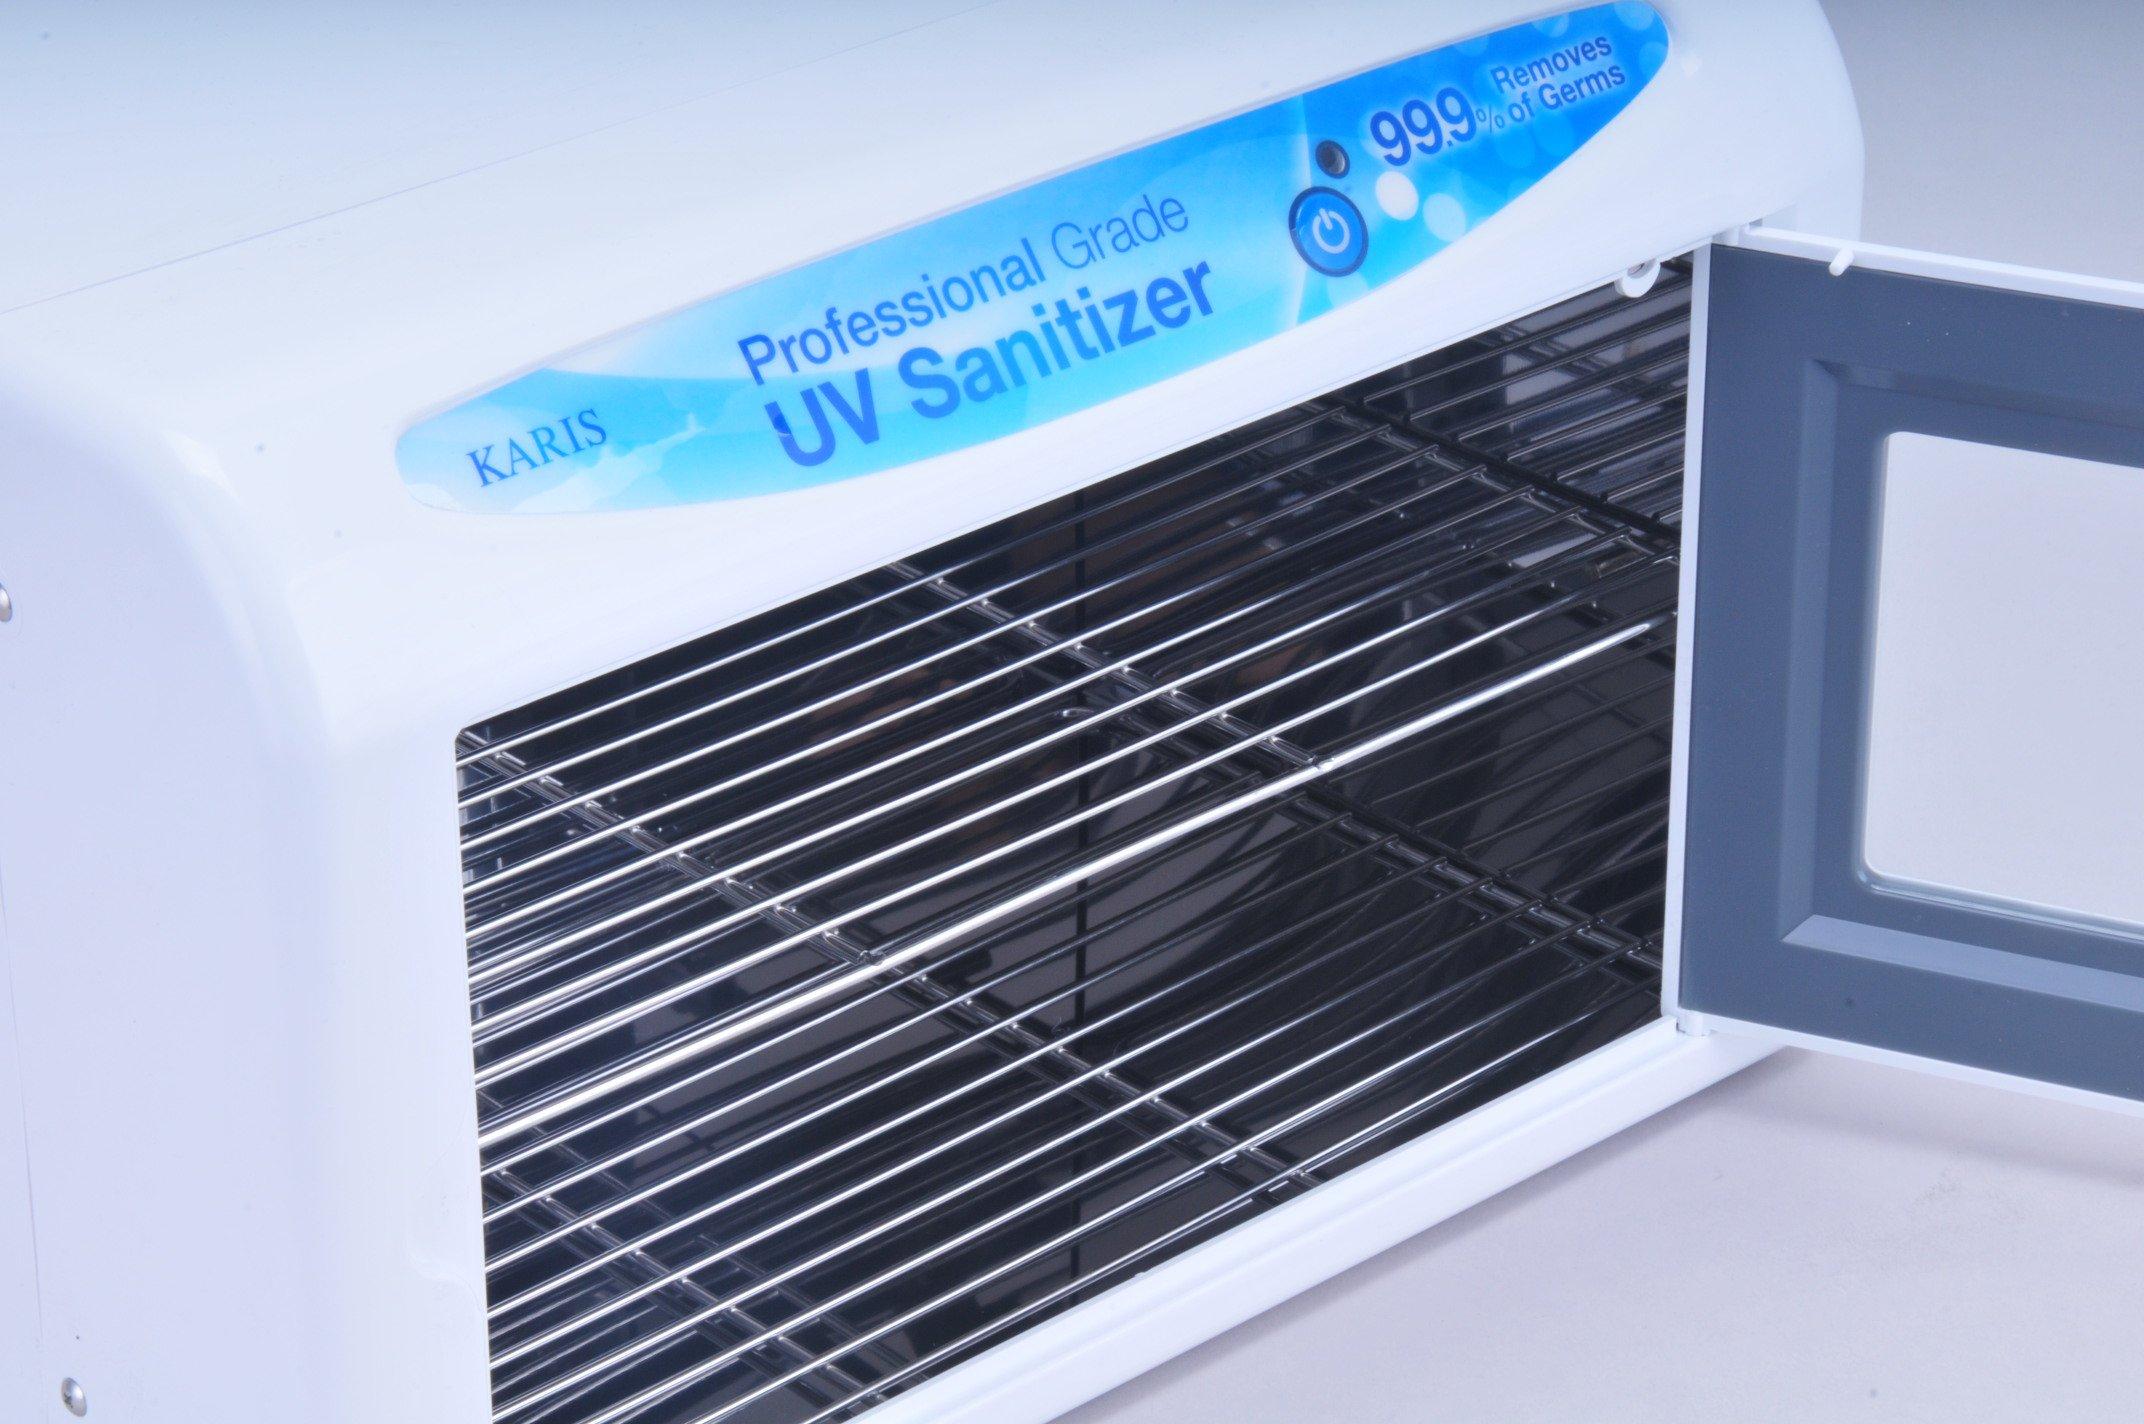 Karis Professional Grade UV Sanitizer/Sterilizer (13L) by Karis